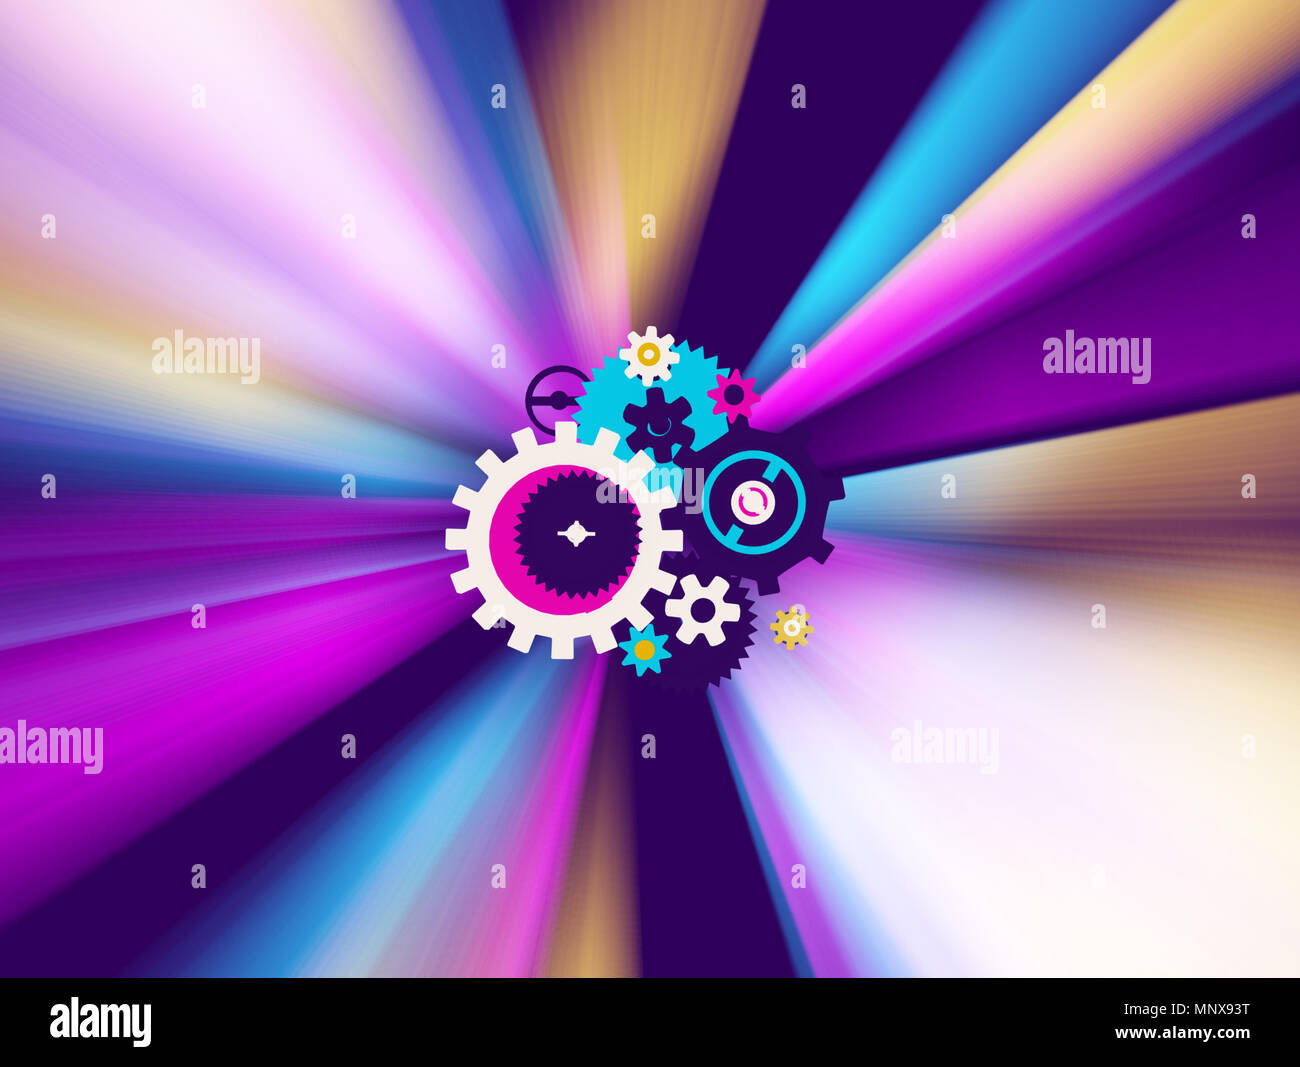 Color light spectrum 3d illustration, mechanism gears center, horizontal background - Stock Image